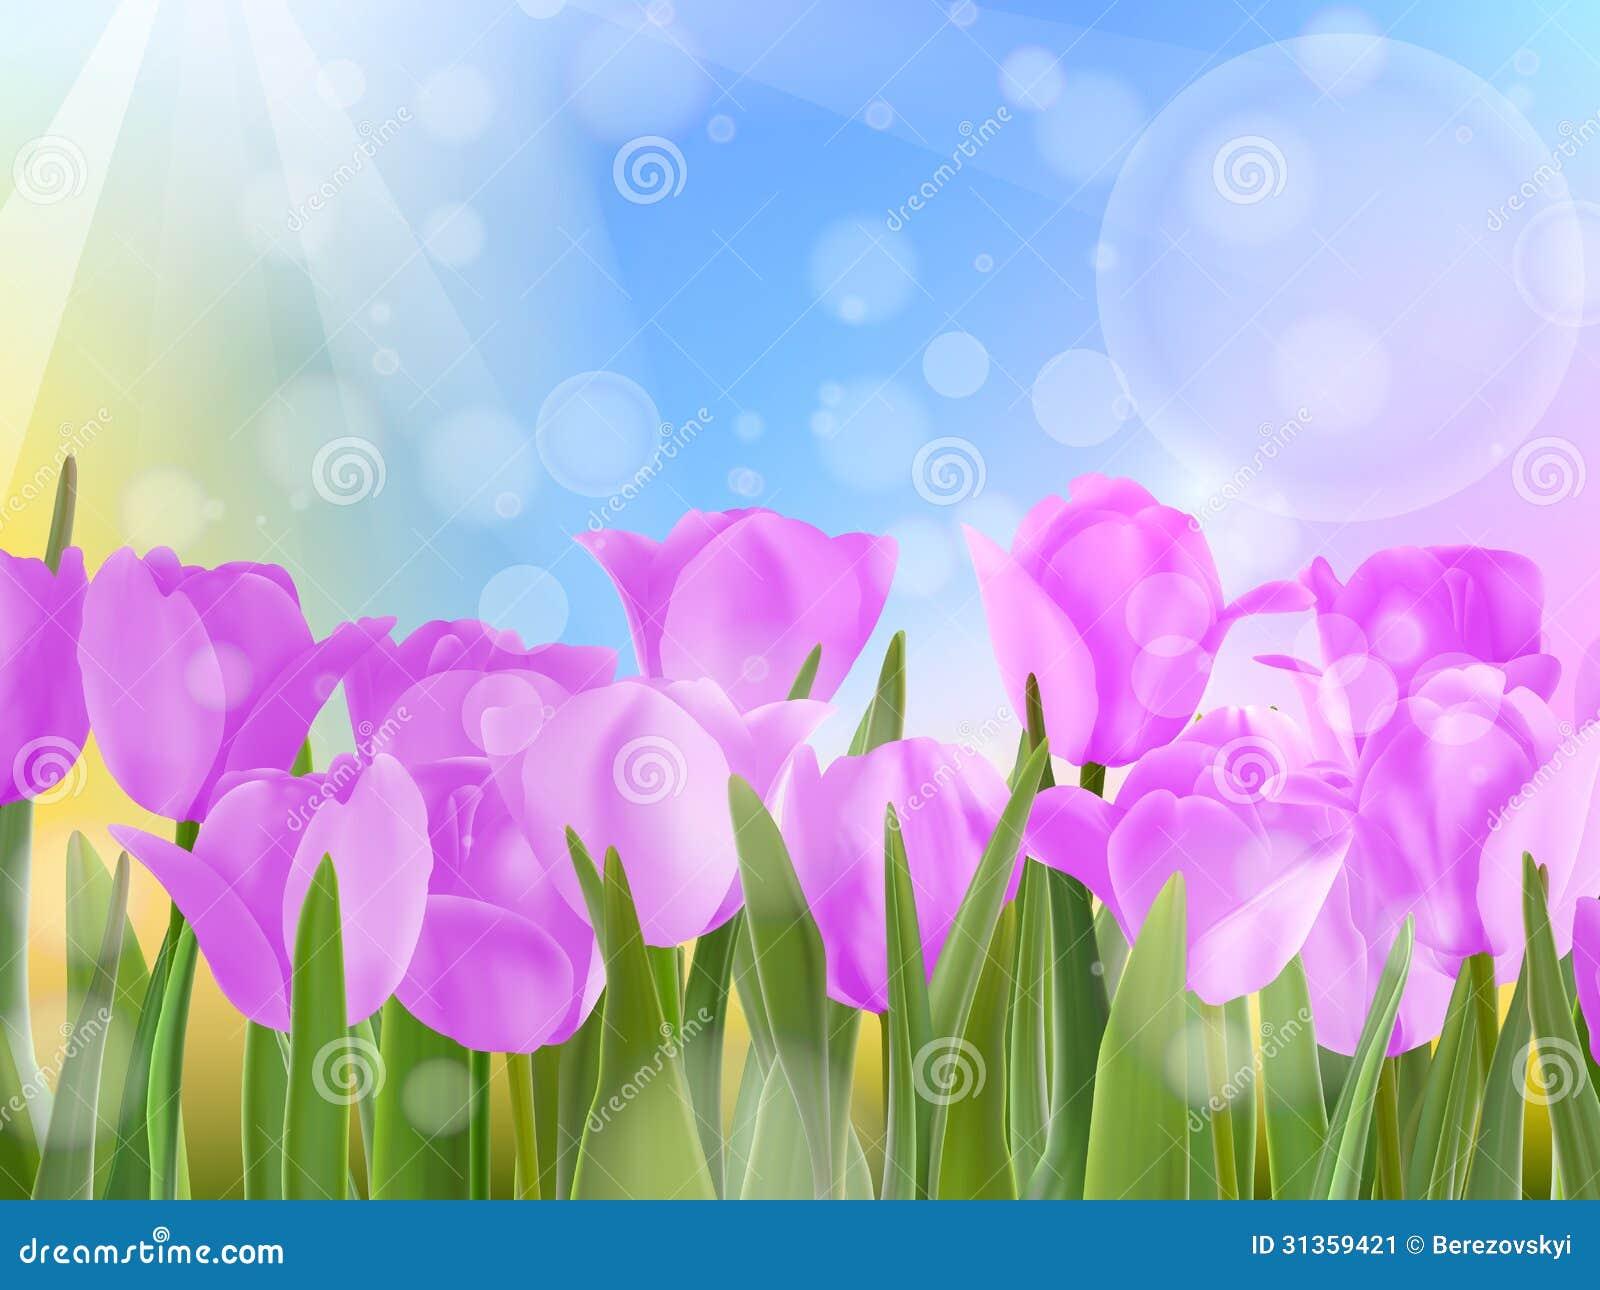 Tulips in garden on blue sky. EPS 10